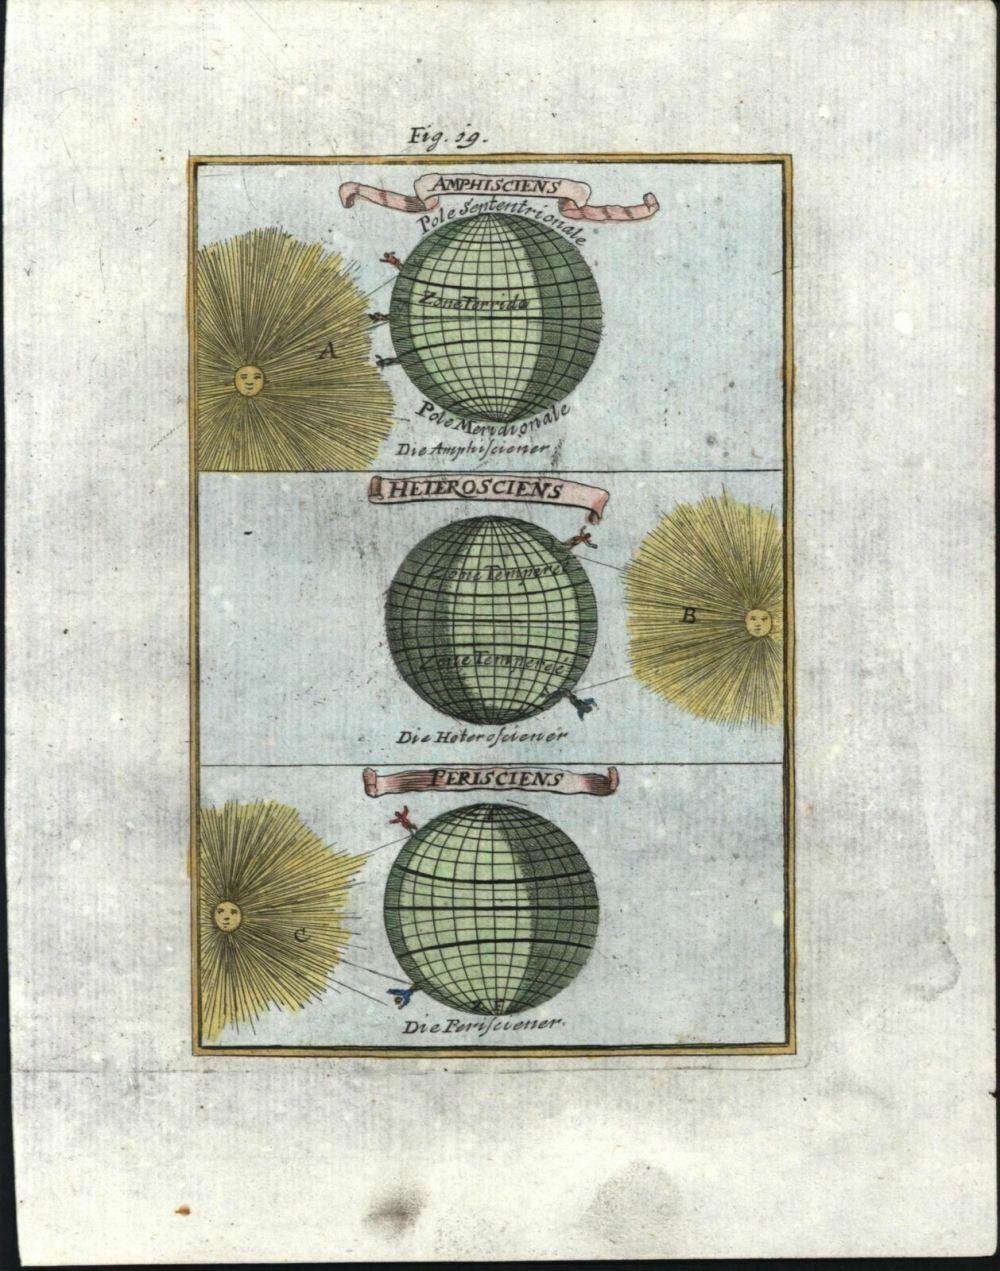 medium resolution of  celestial sun light distribution diagram earth 1719 mallet lovely hand color